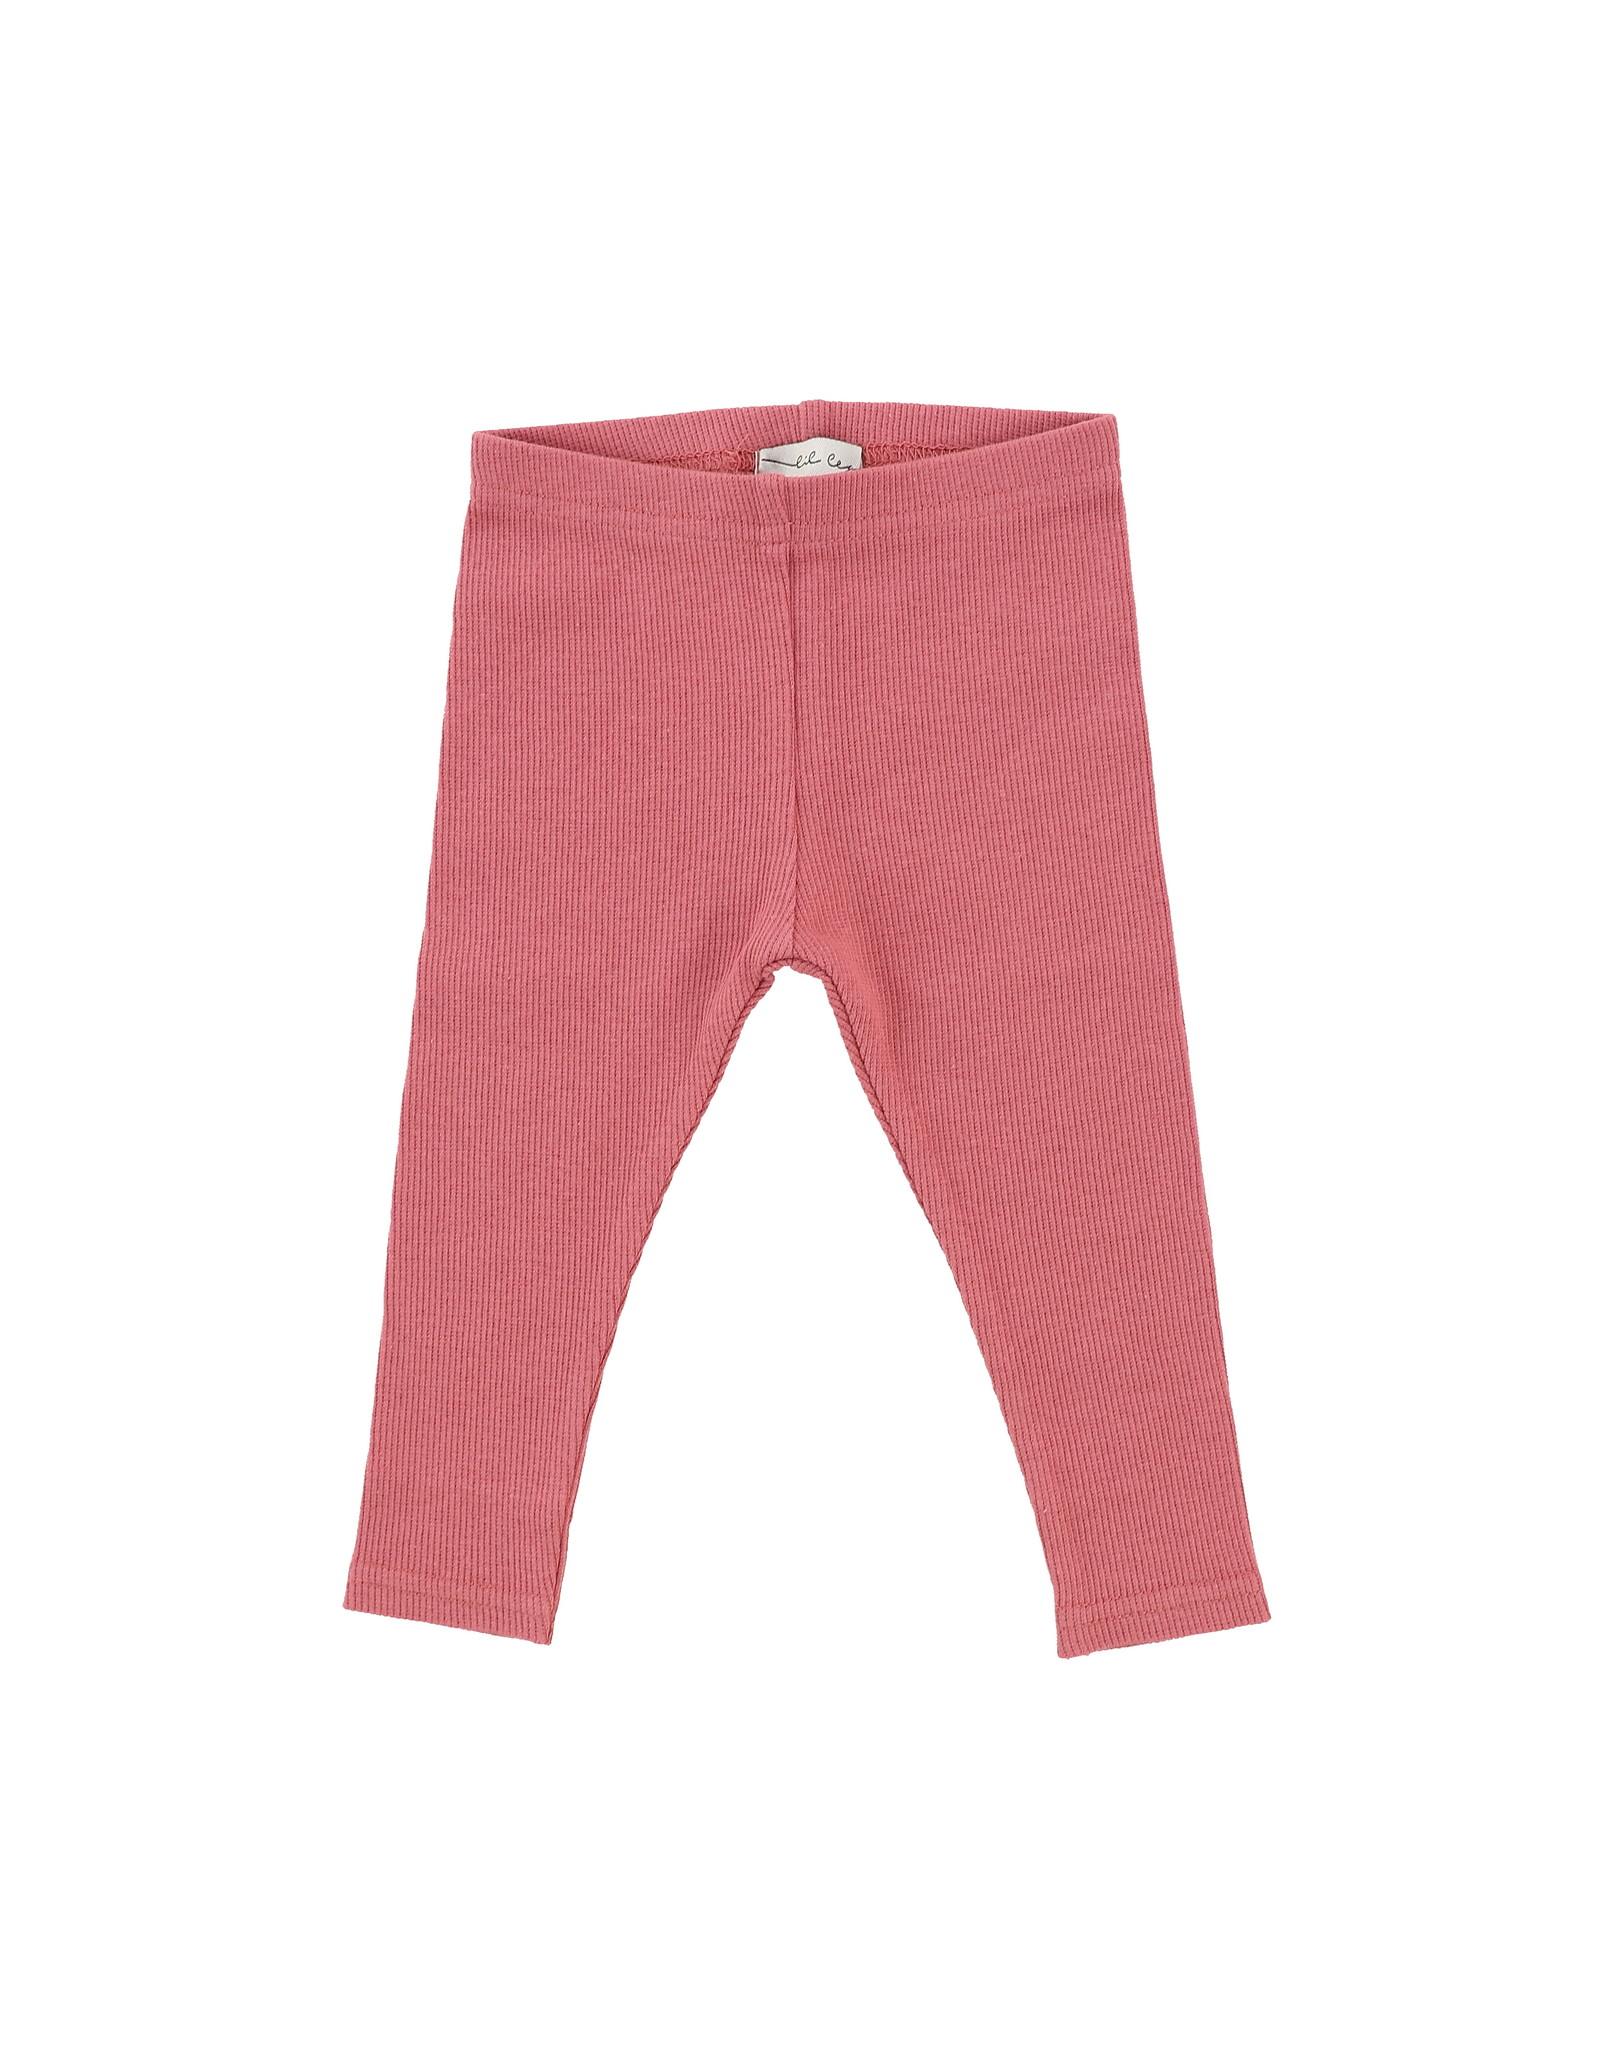 LIL LEGS SS20 Ribbed Leggings Fashion Colors